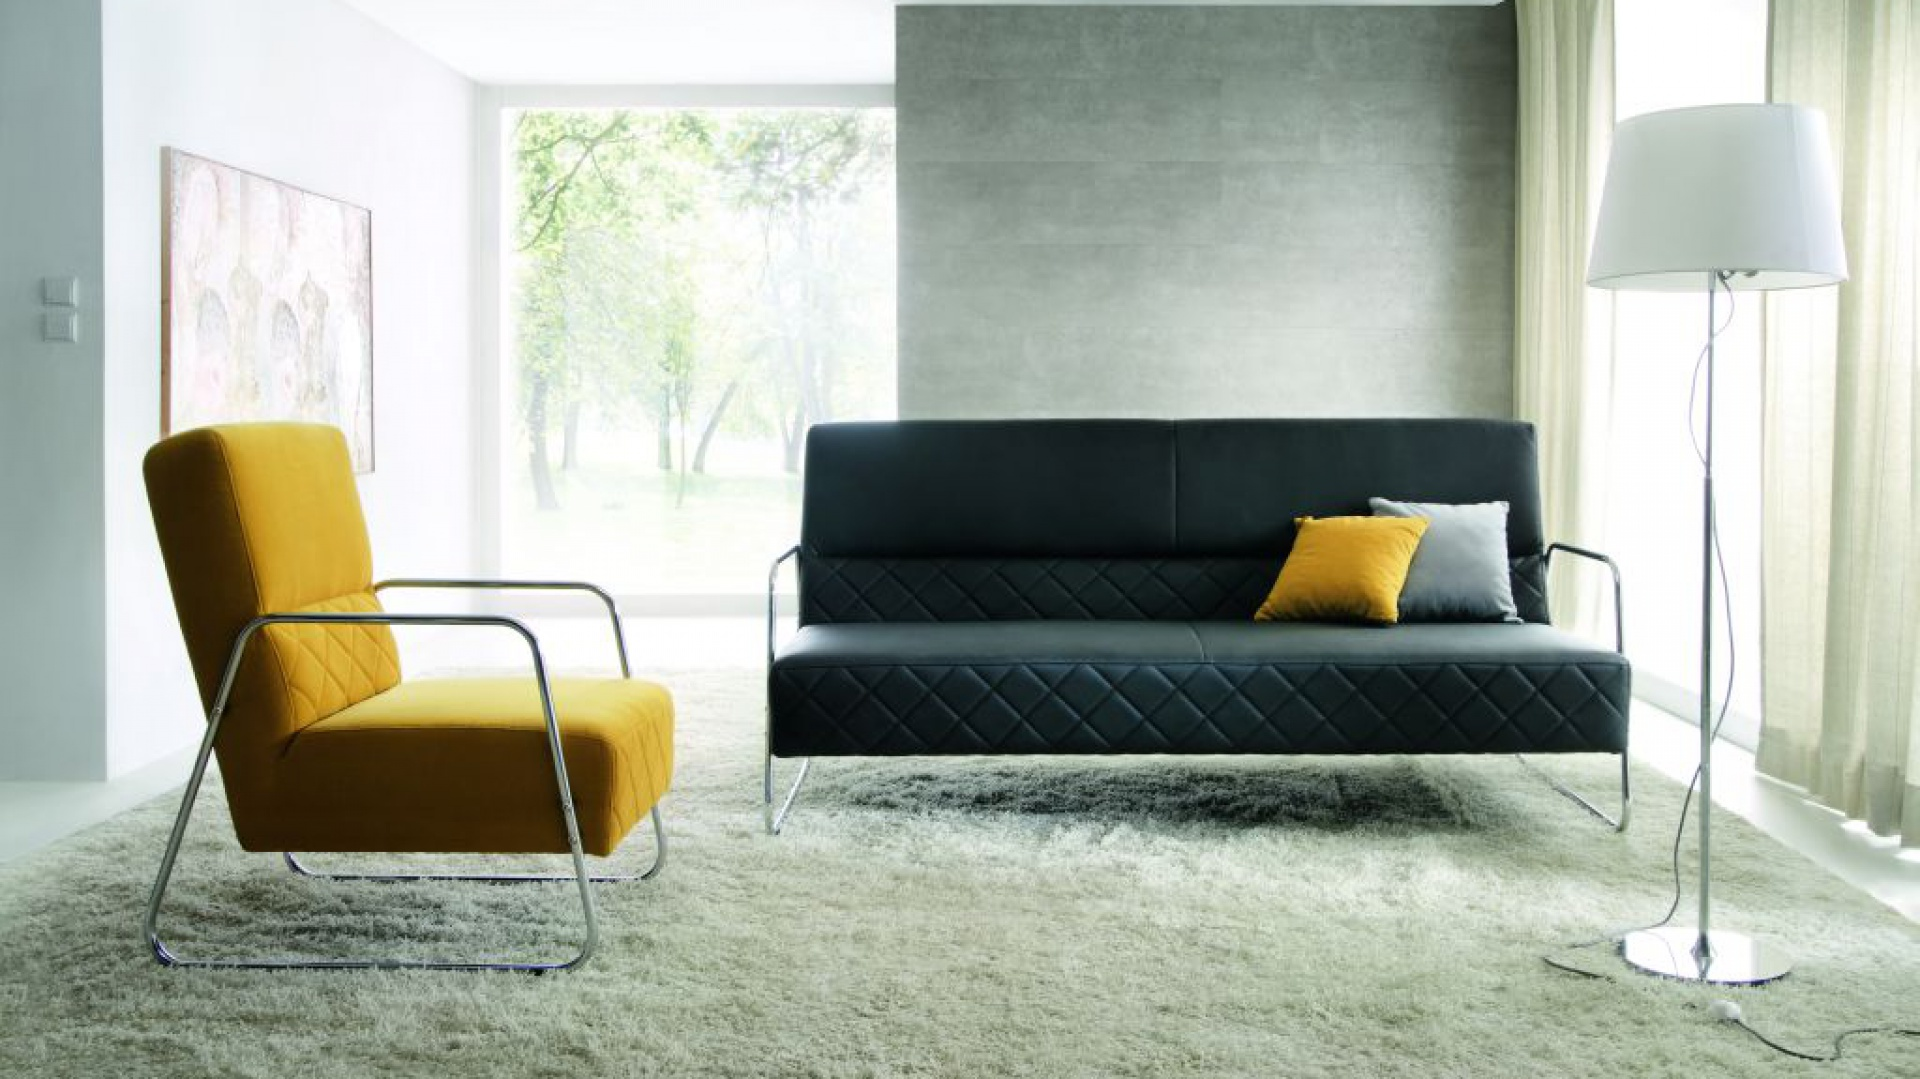 Kolekcja mebli konkurs dobry design 2014 for Decor hotel sp z o o